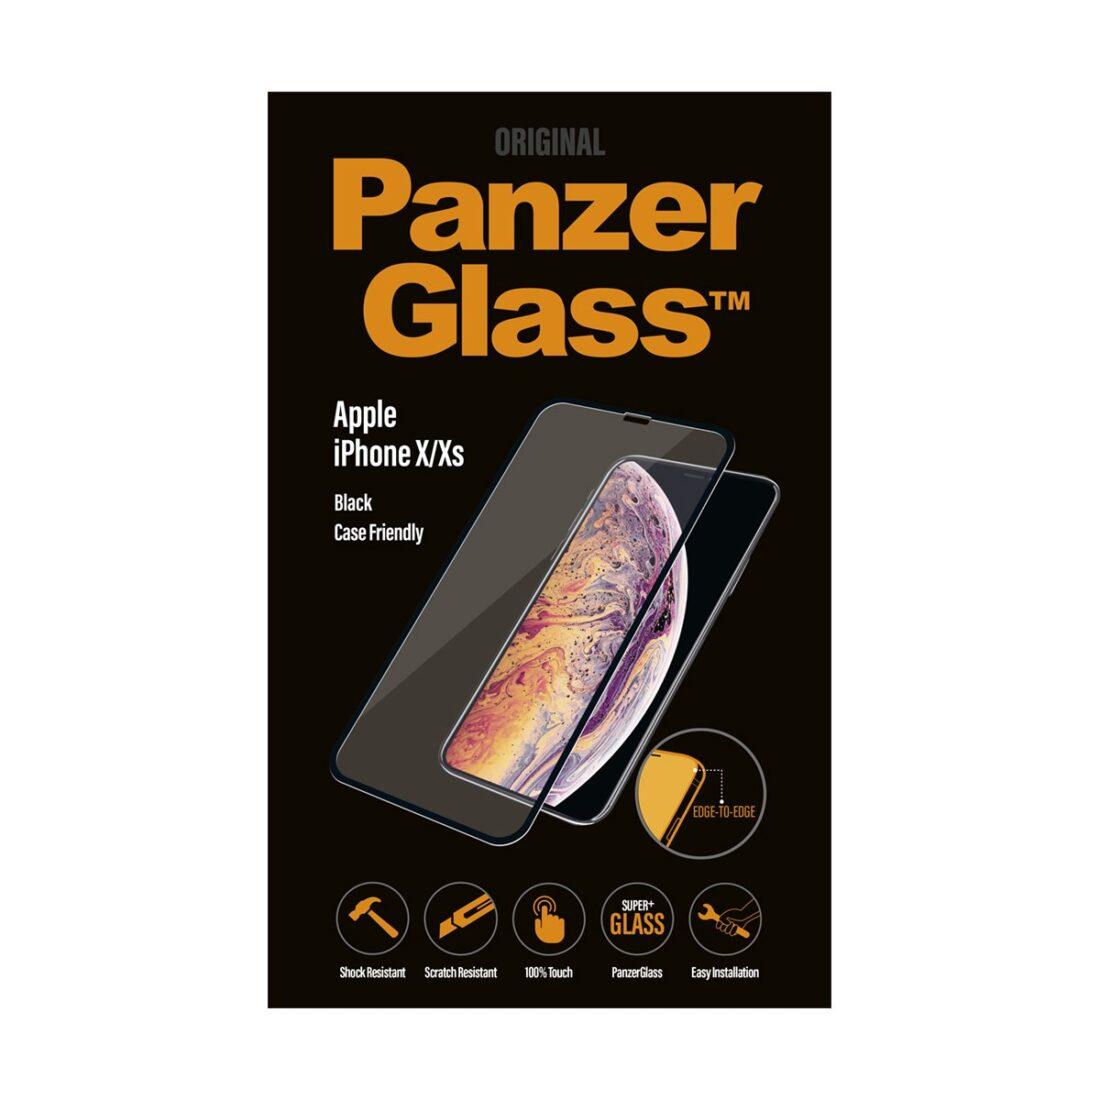 PanzerGlass Apple iPhone X / Xs - Black - Case Friendly